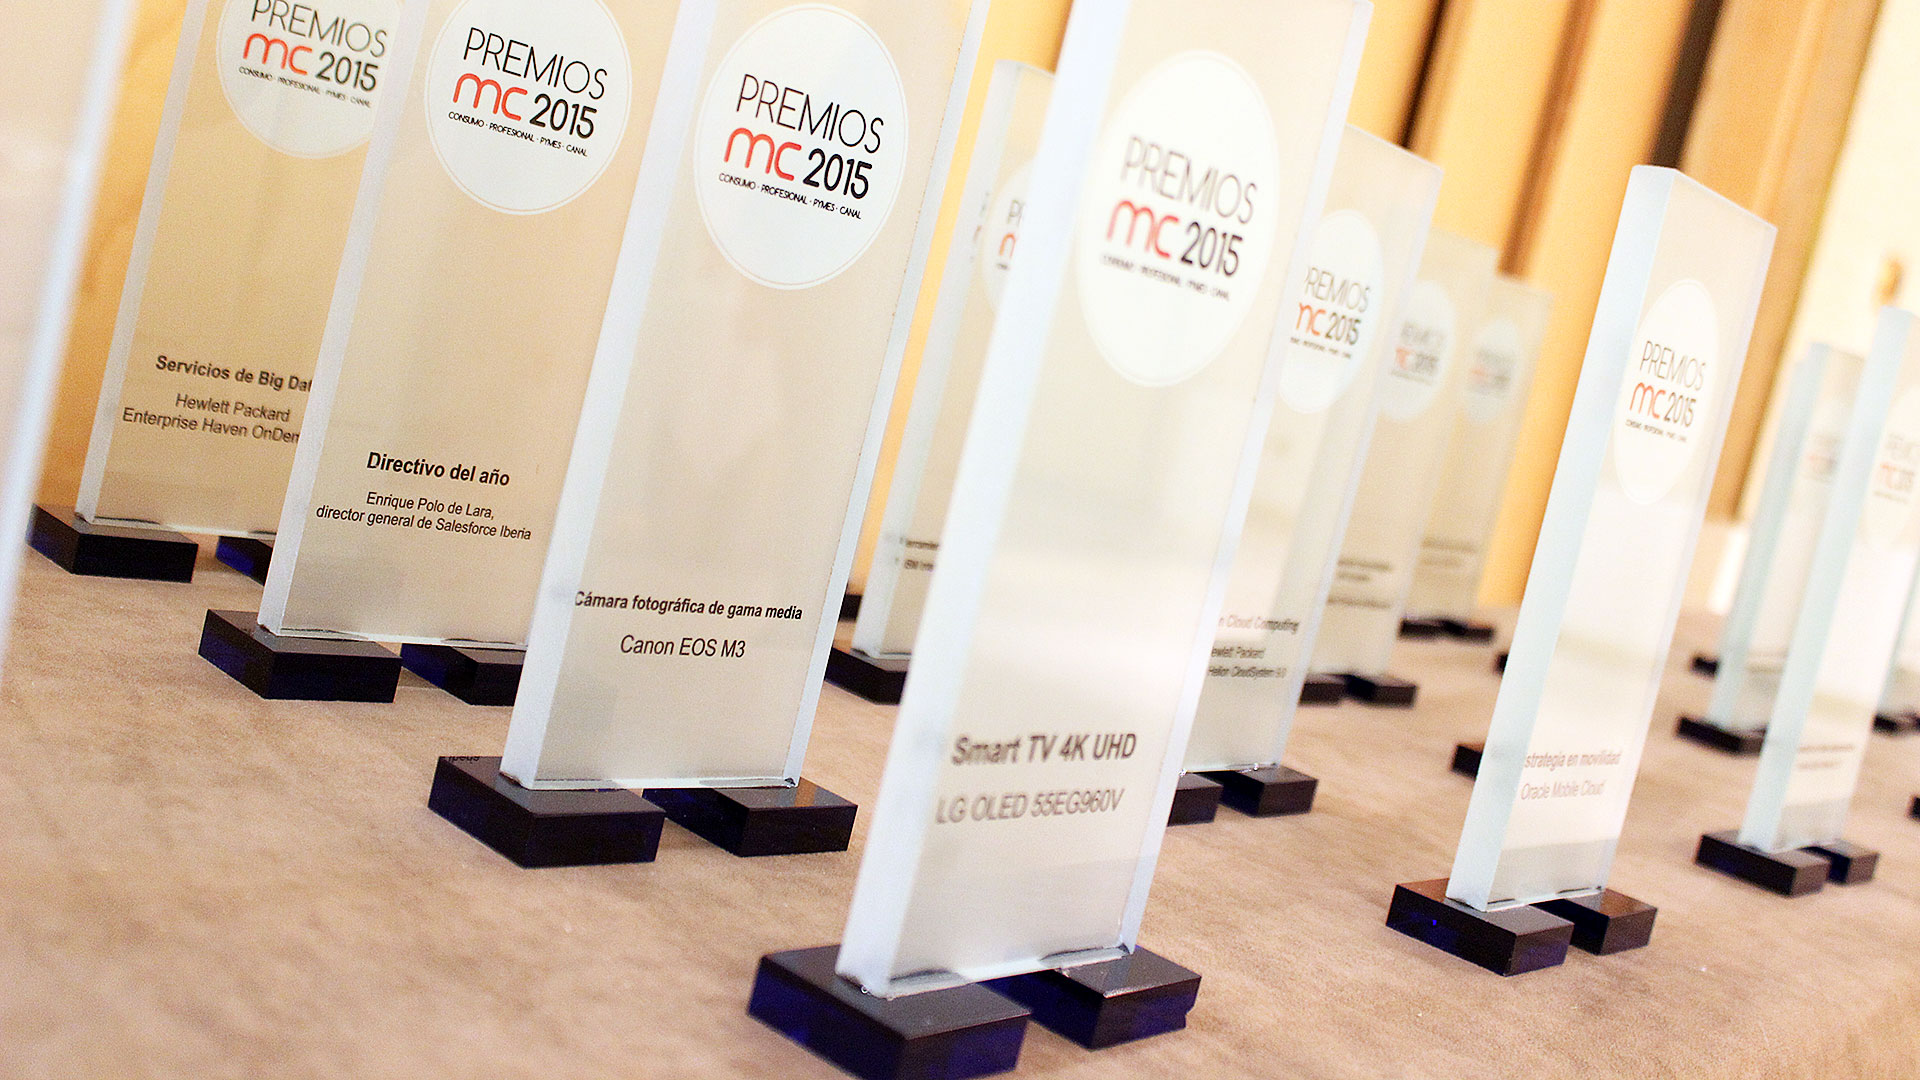 premios-mc2015-evento-comida-hotel-hesperia-trofeo-detalle-escorzo